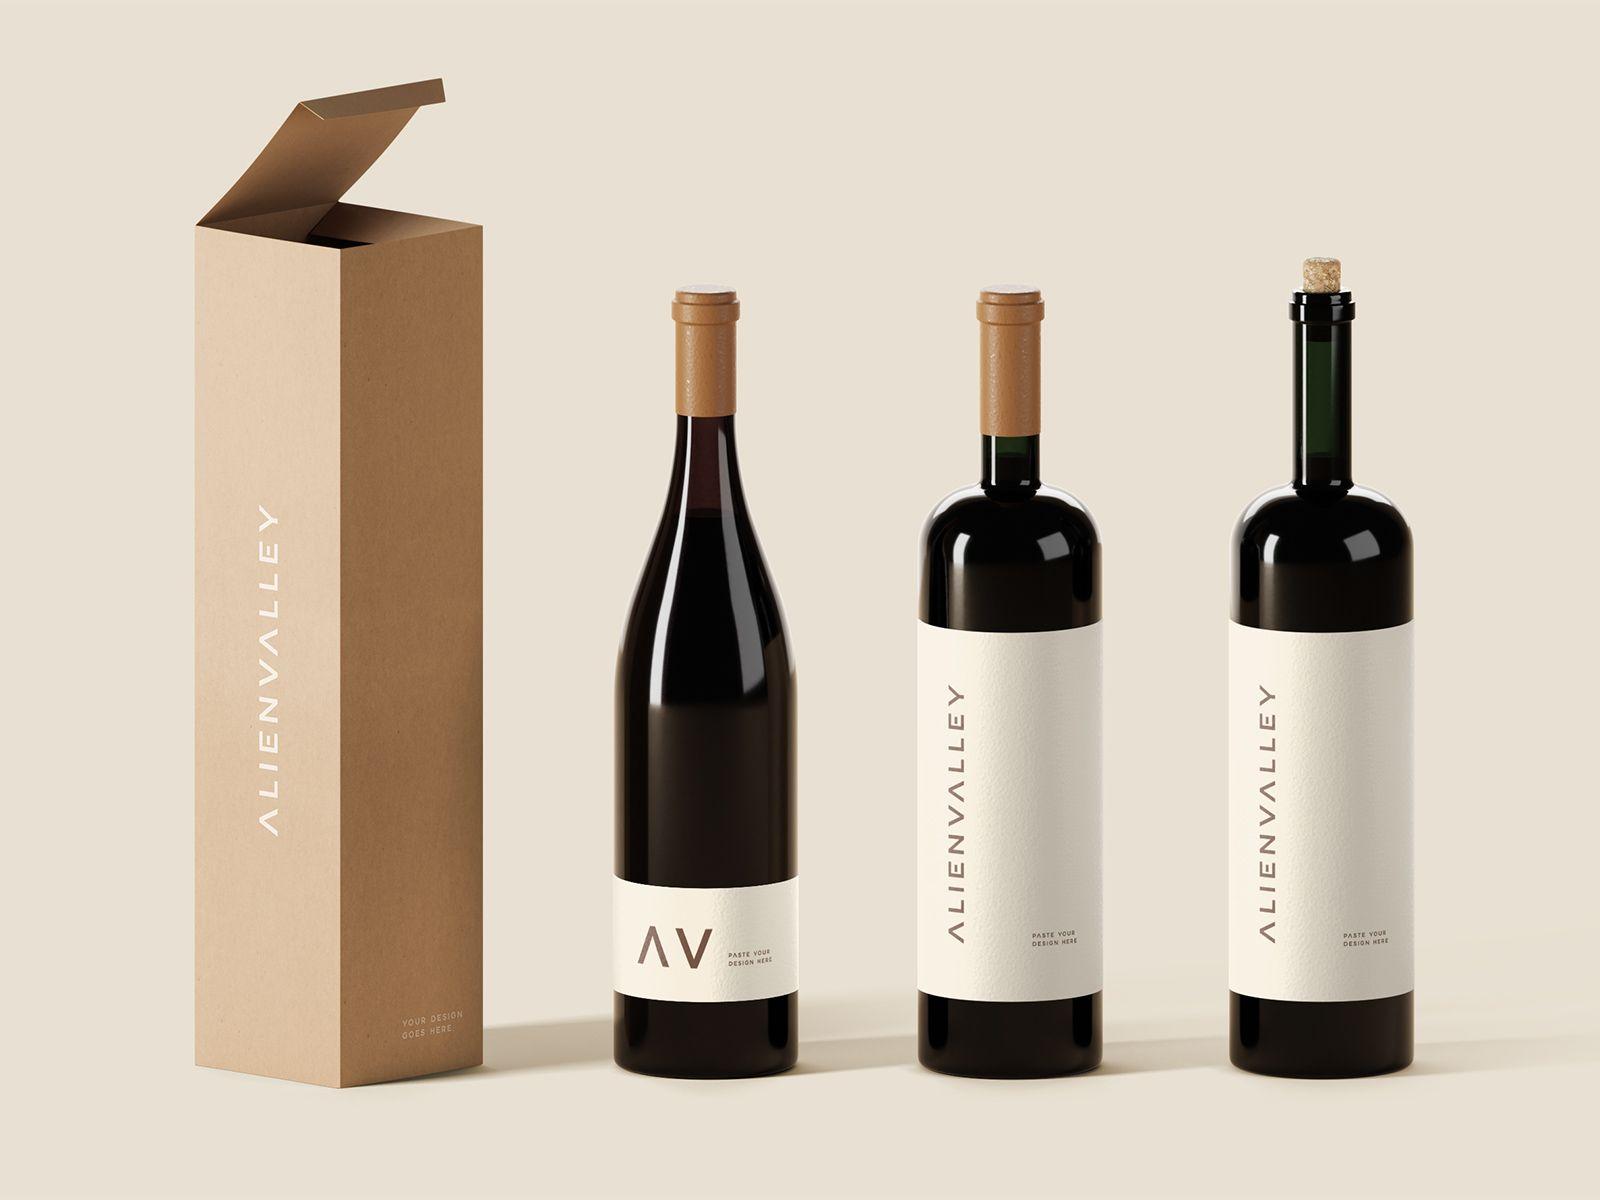 Our mockups allow you to immediately visualize your design. 10395 Bag Wine Mockup Best Free Mockups Free Mockups Psd Template Design Assets